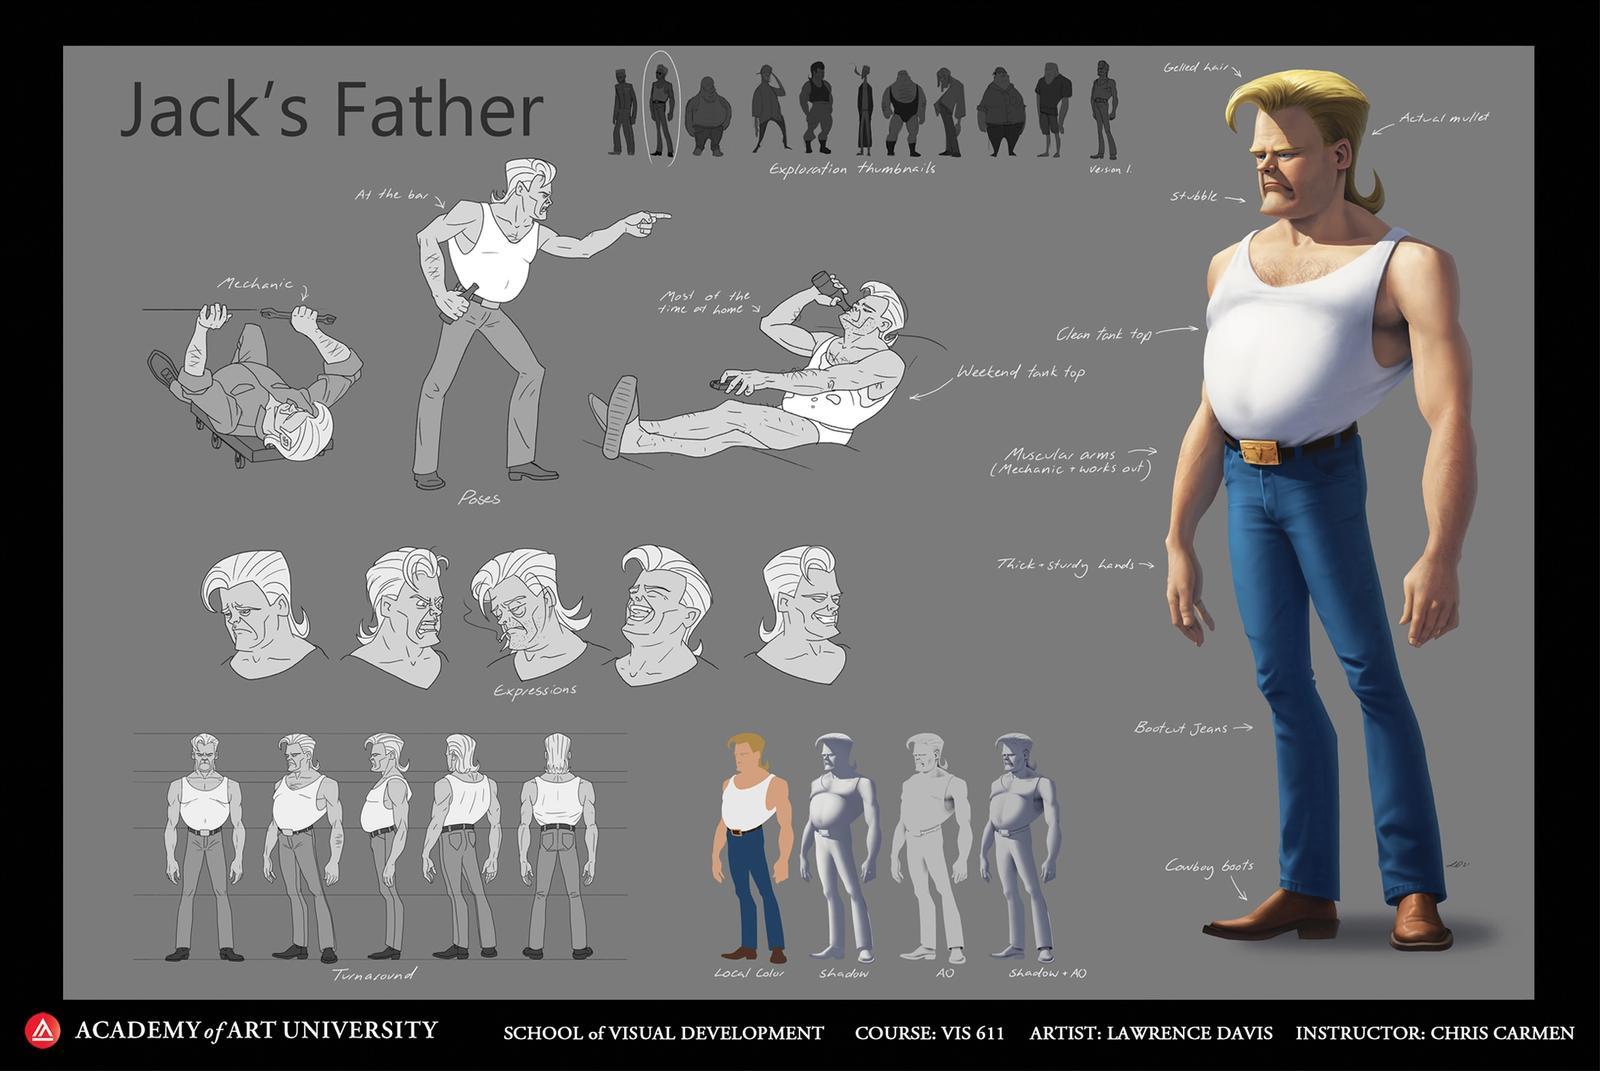 Jackson's Father